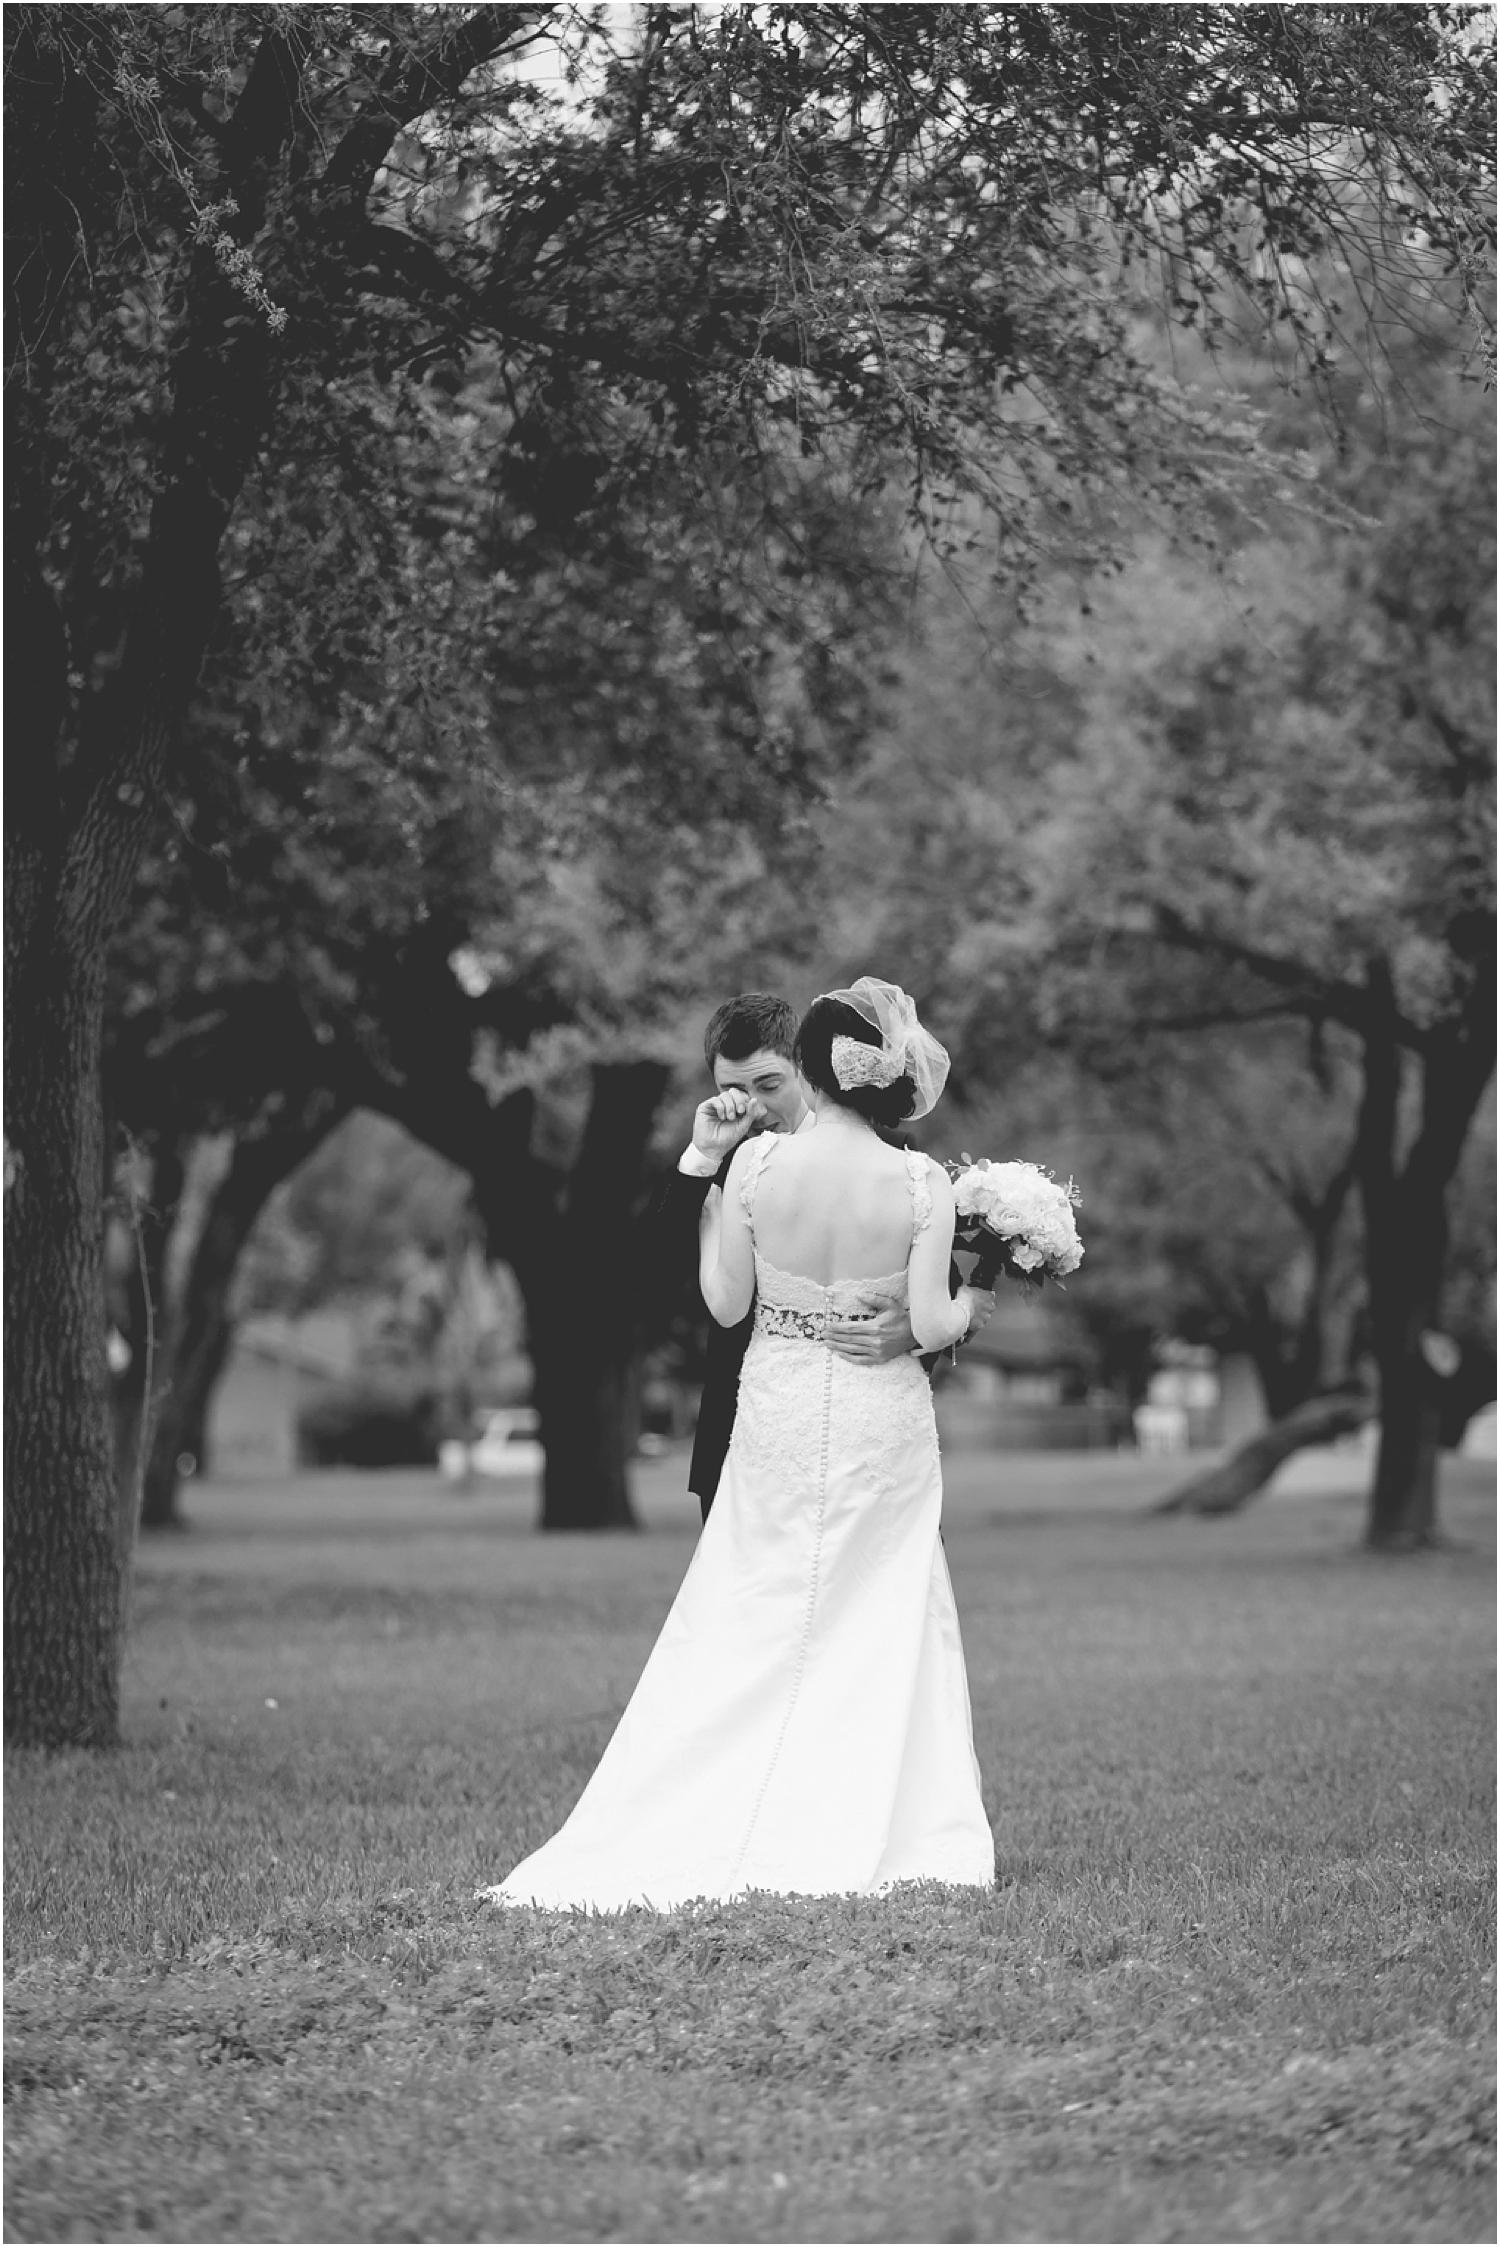 20150314-texas-outdoor-wedding-23_blog.jpg